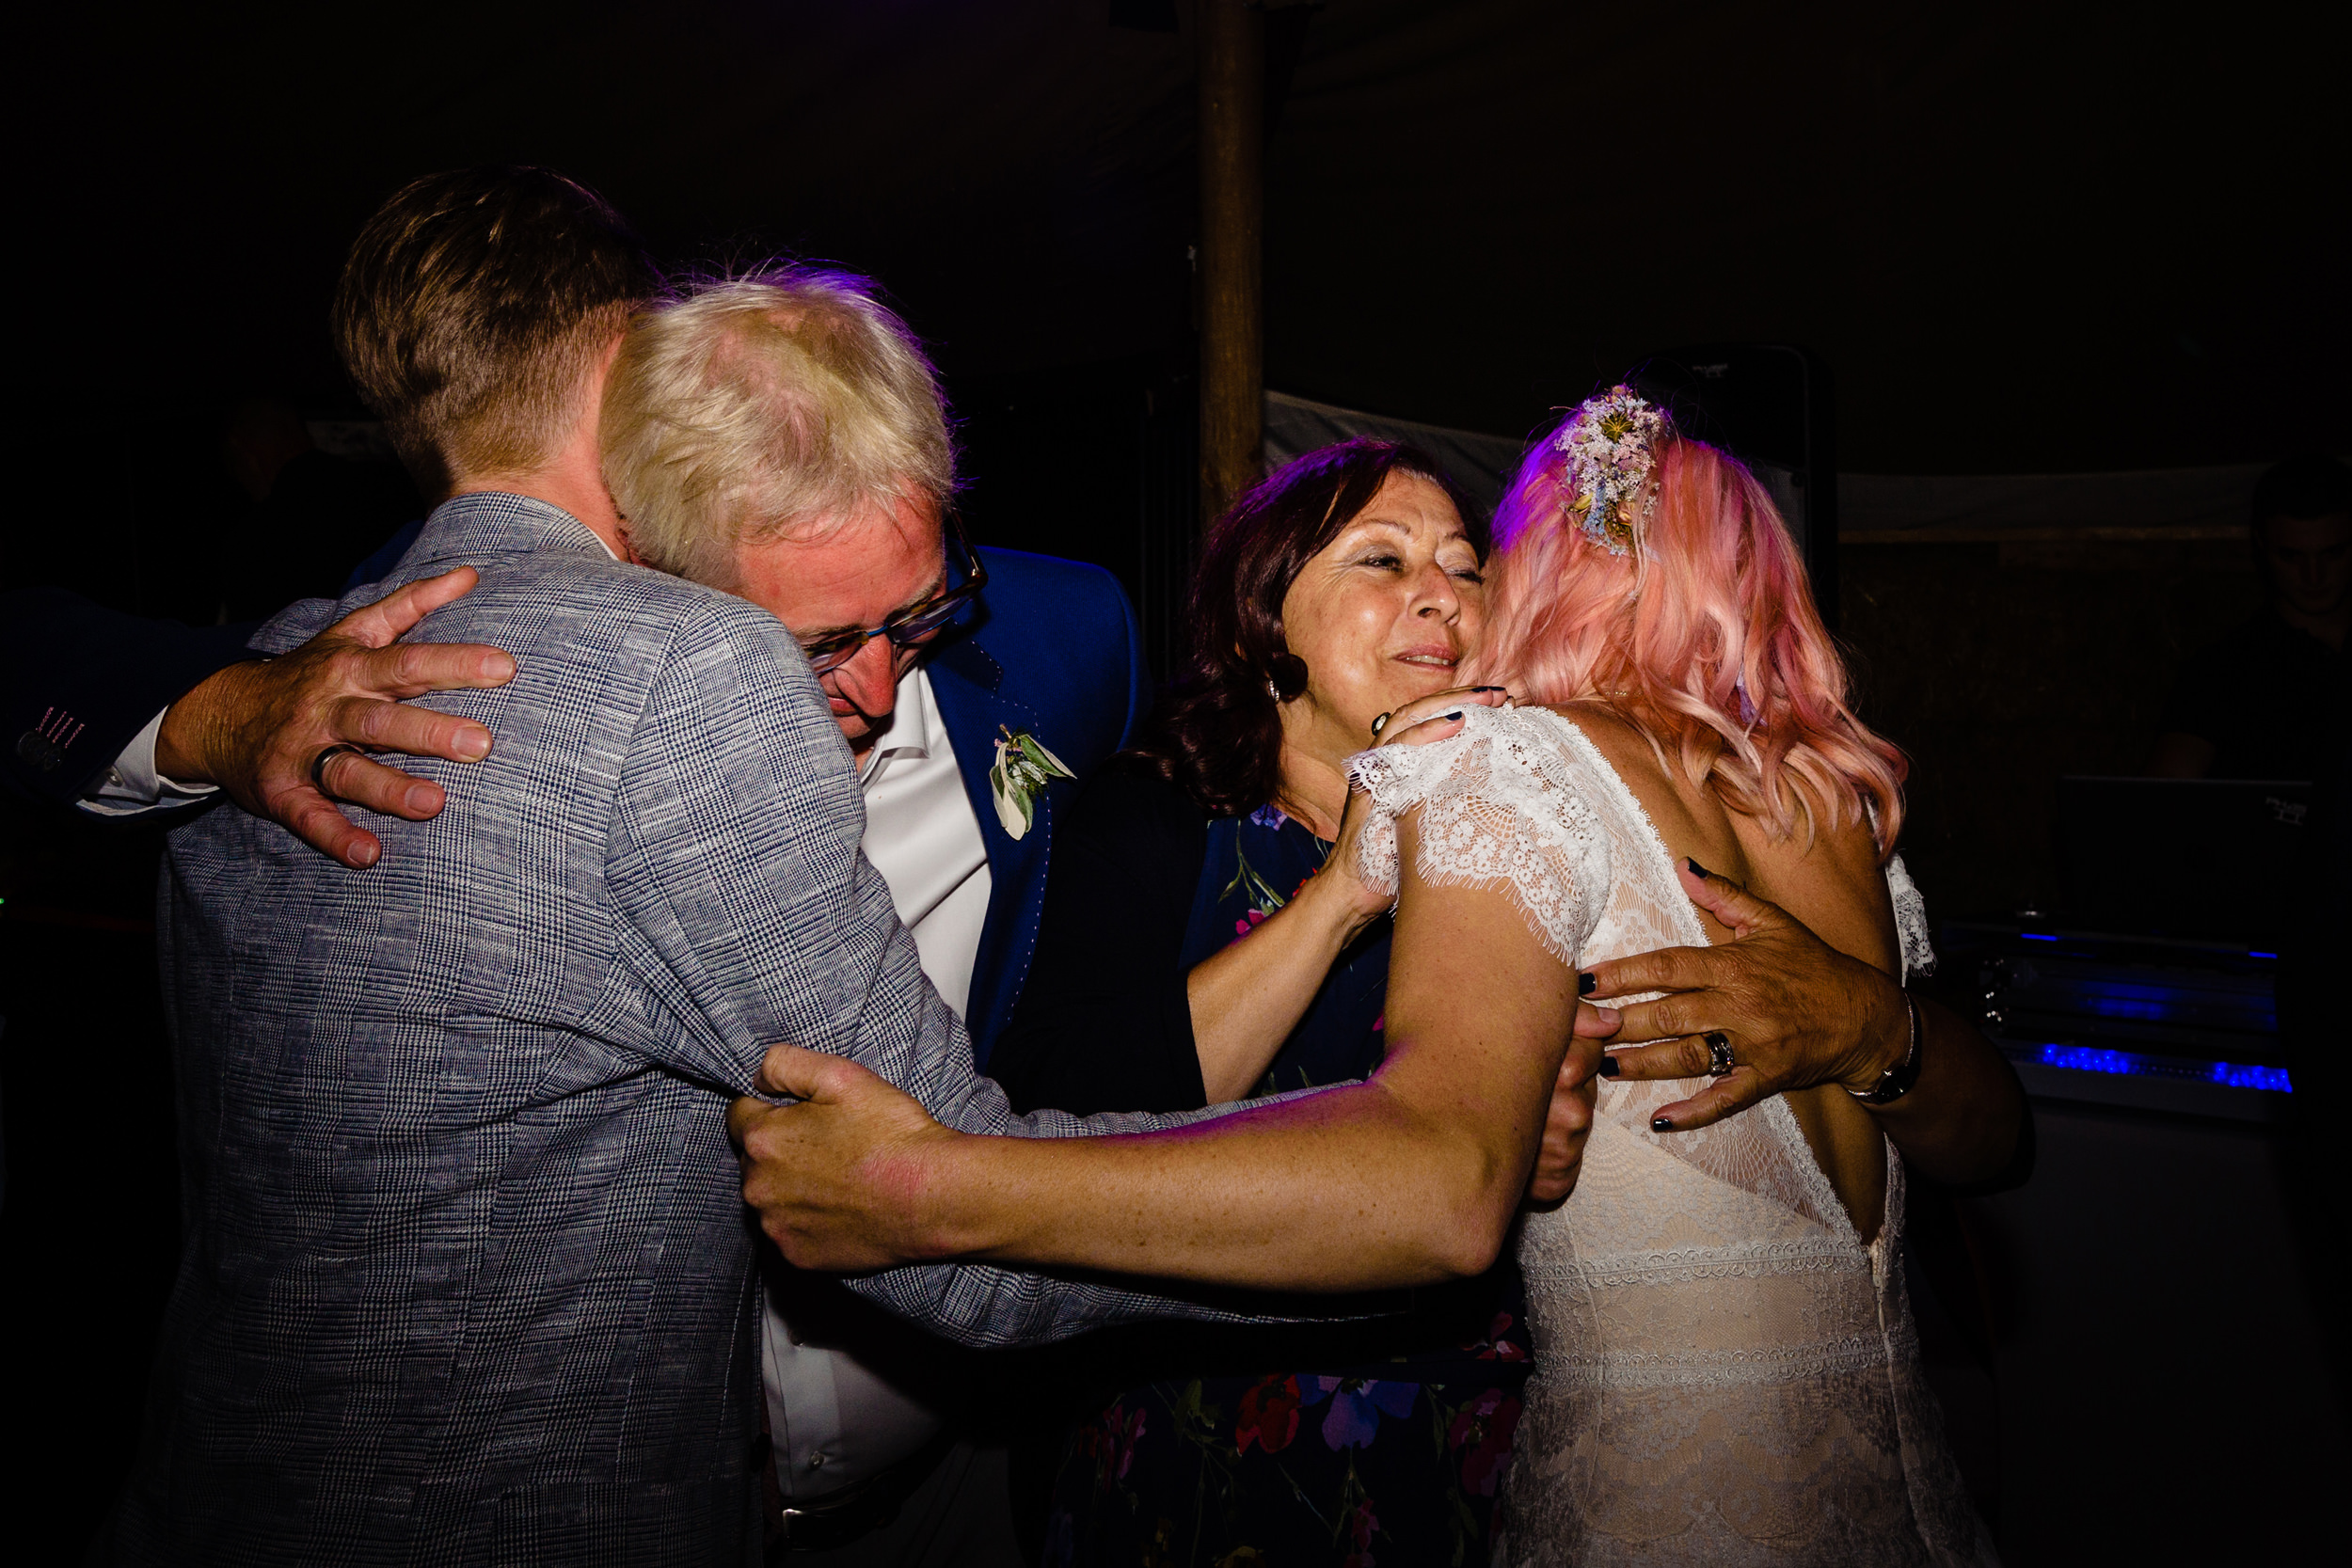 bride and groom hug parents on dancefloor. maybush wedding co wedding photography by emma and rich.